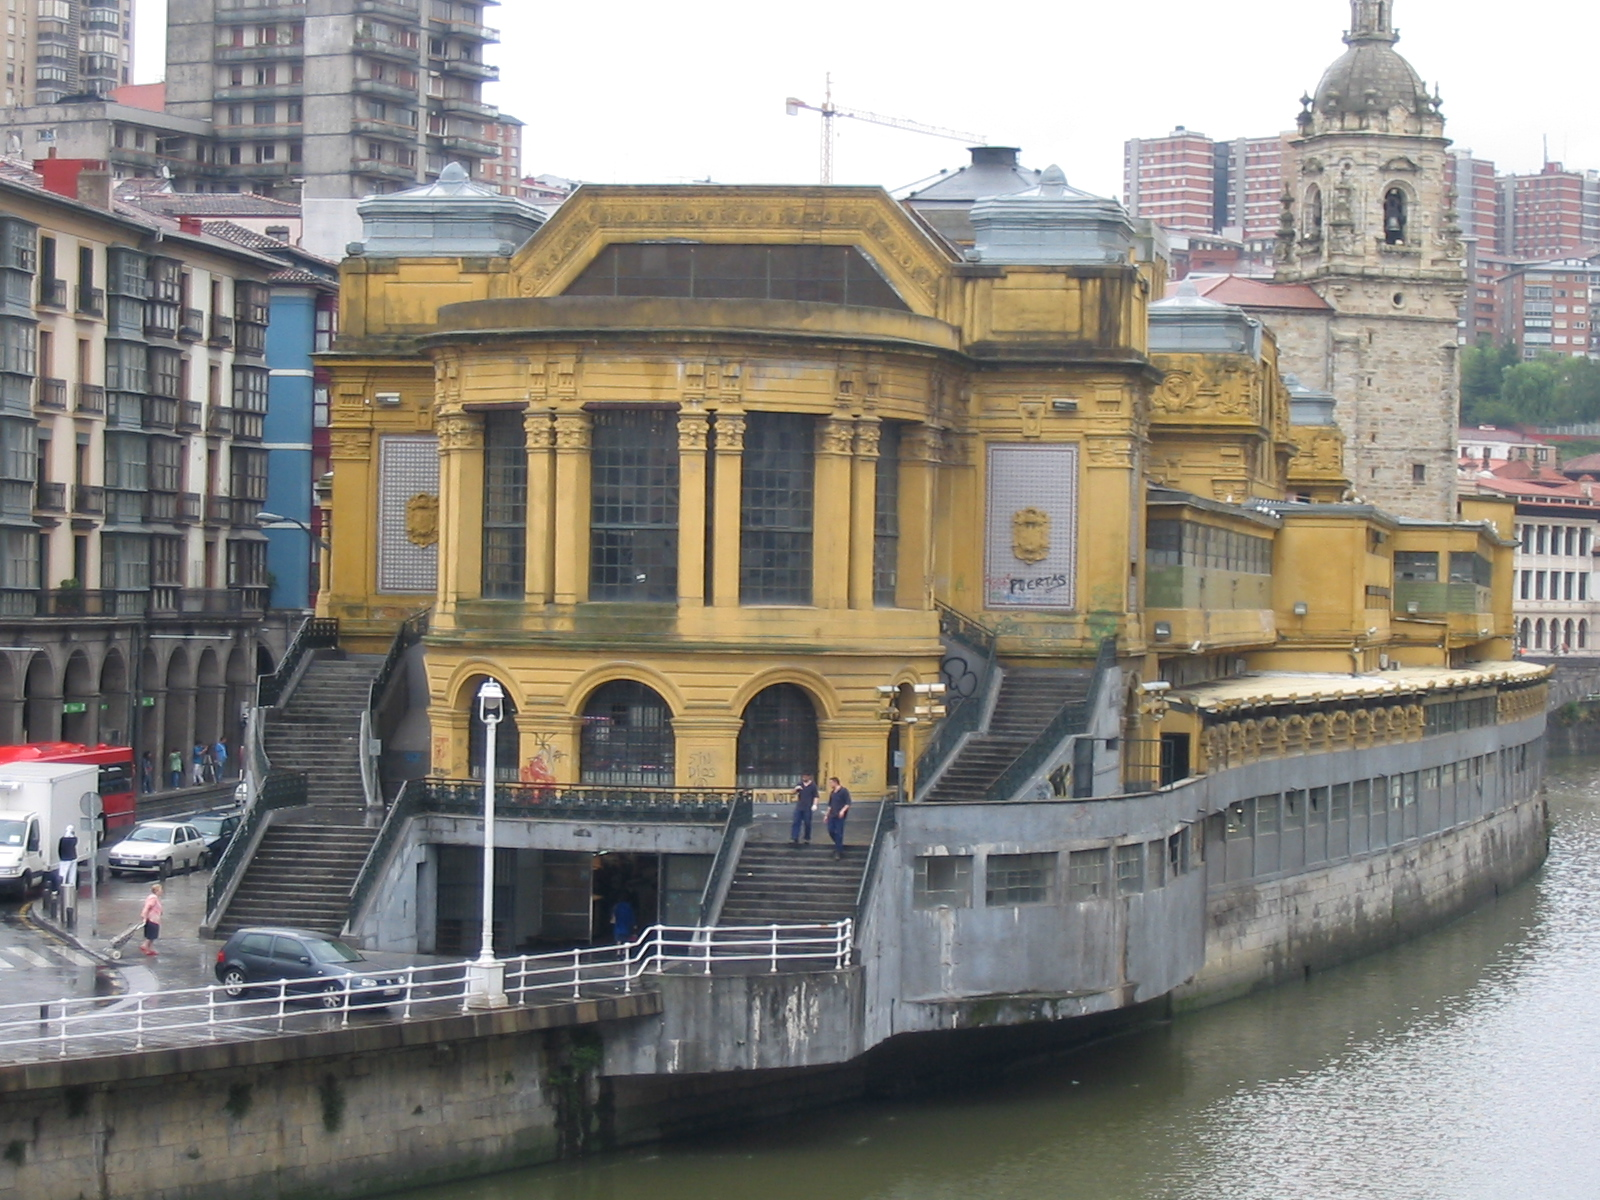 File:Mercado de la Ribera, Bilbao.jpg - Wikimedia Commons